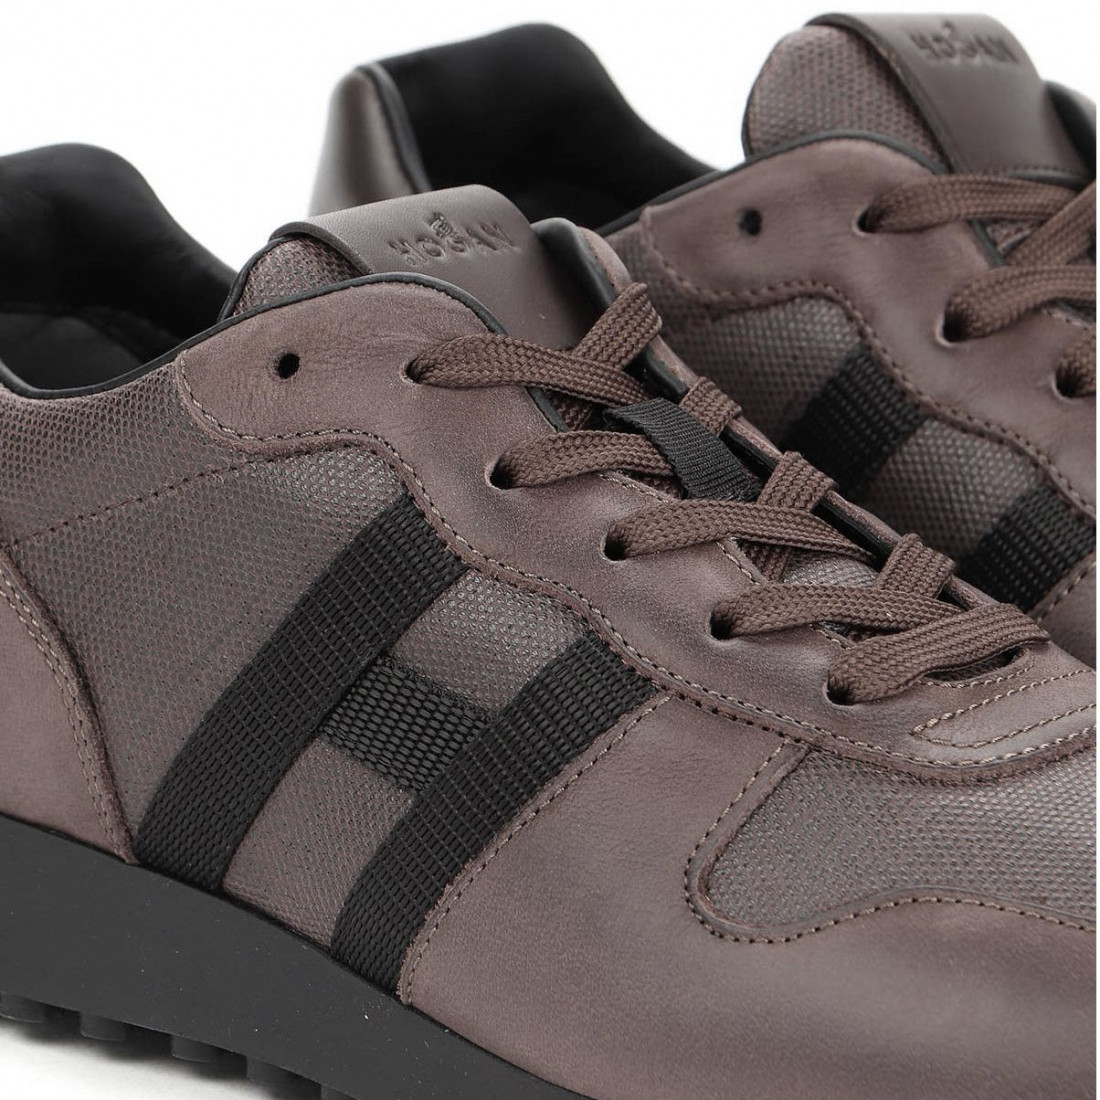 sneakers herren hogan hxm4290cz62oef65nh 7595